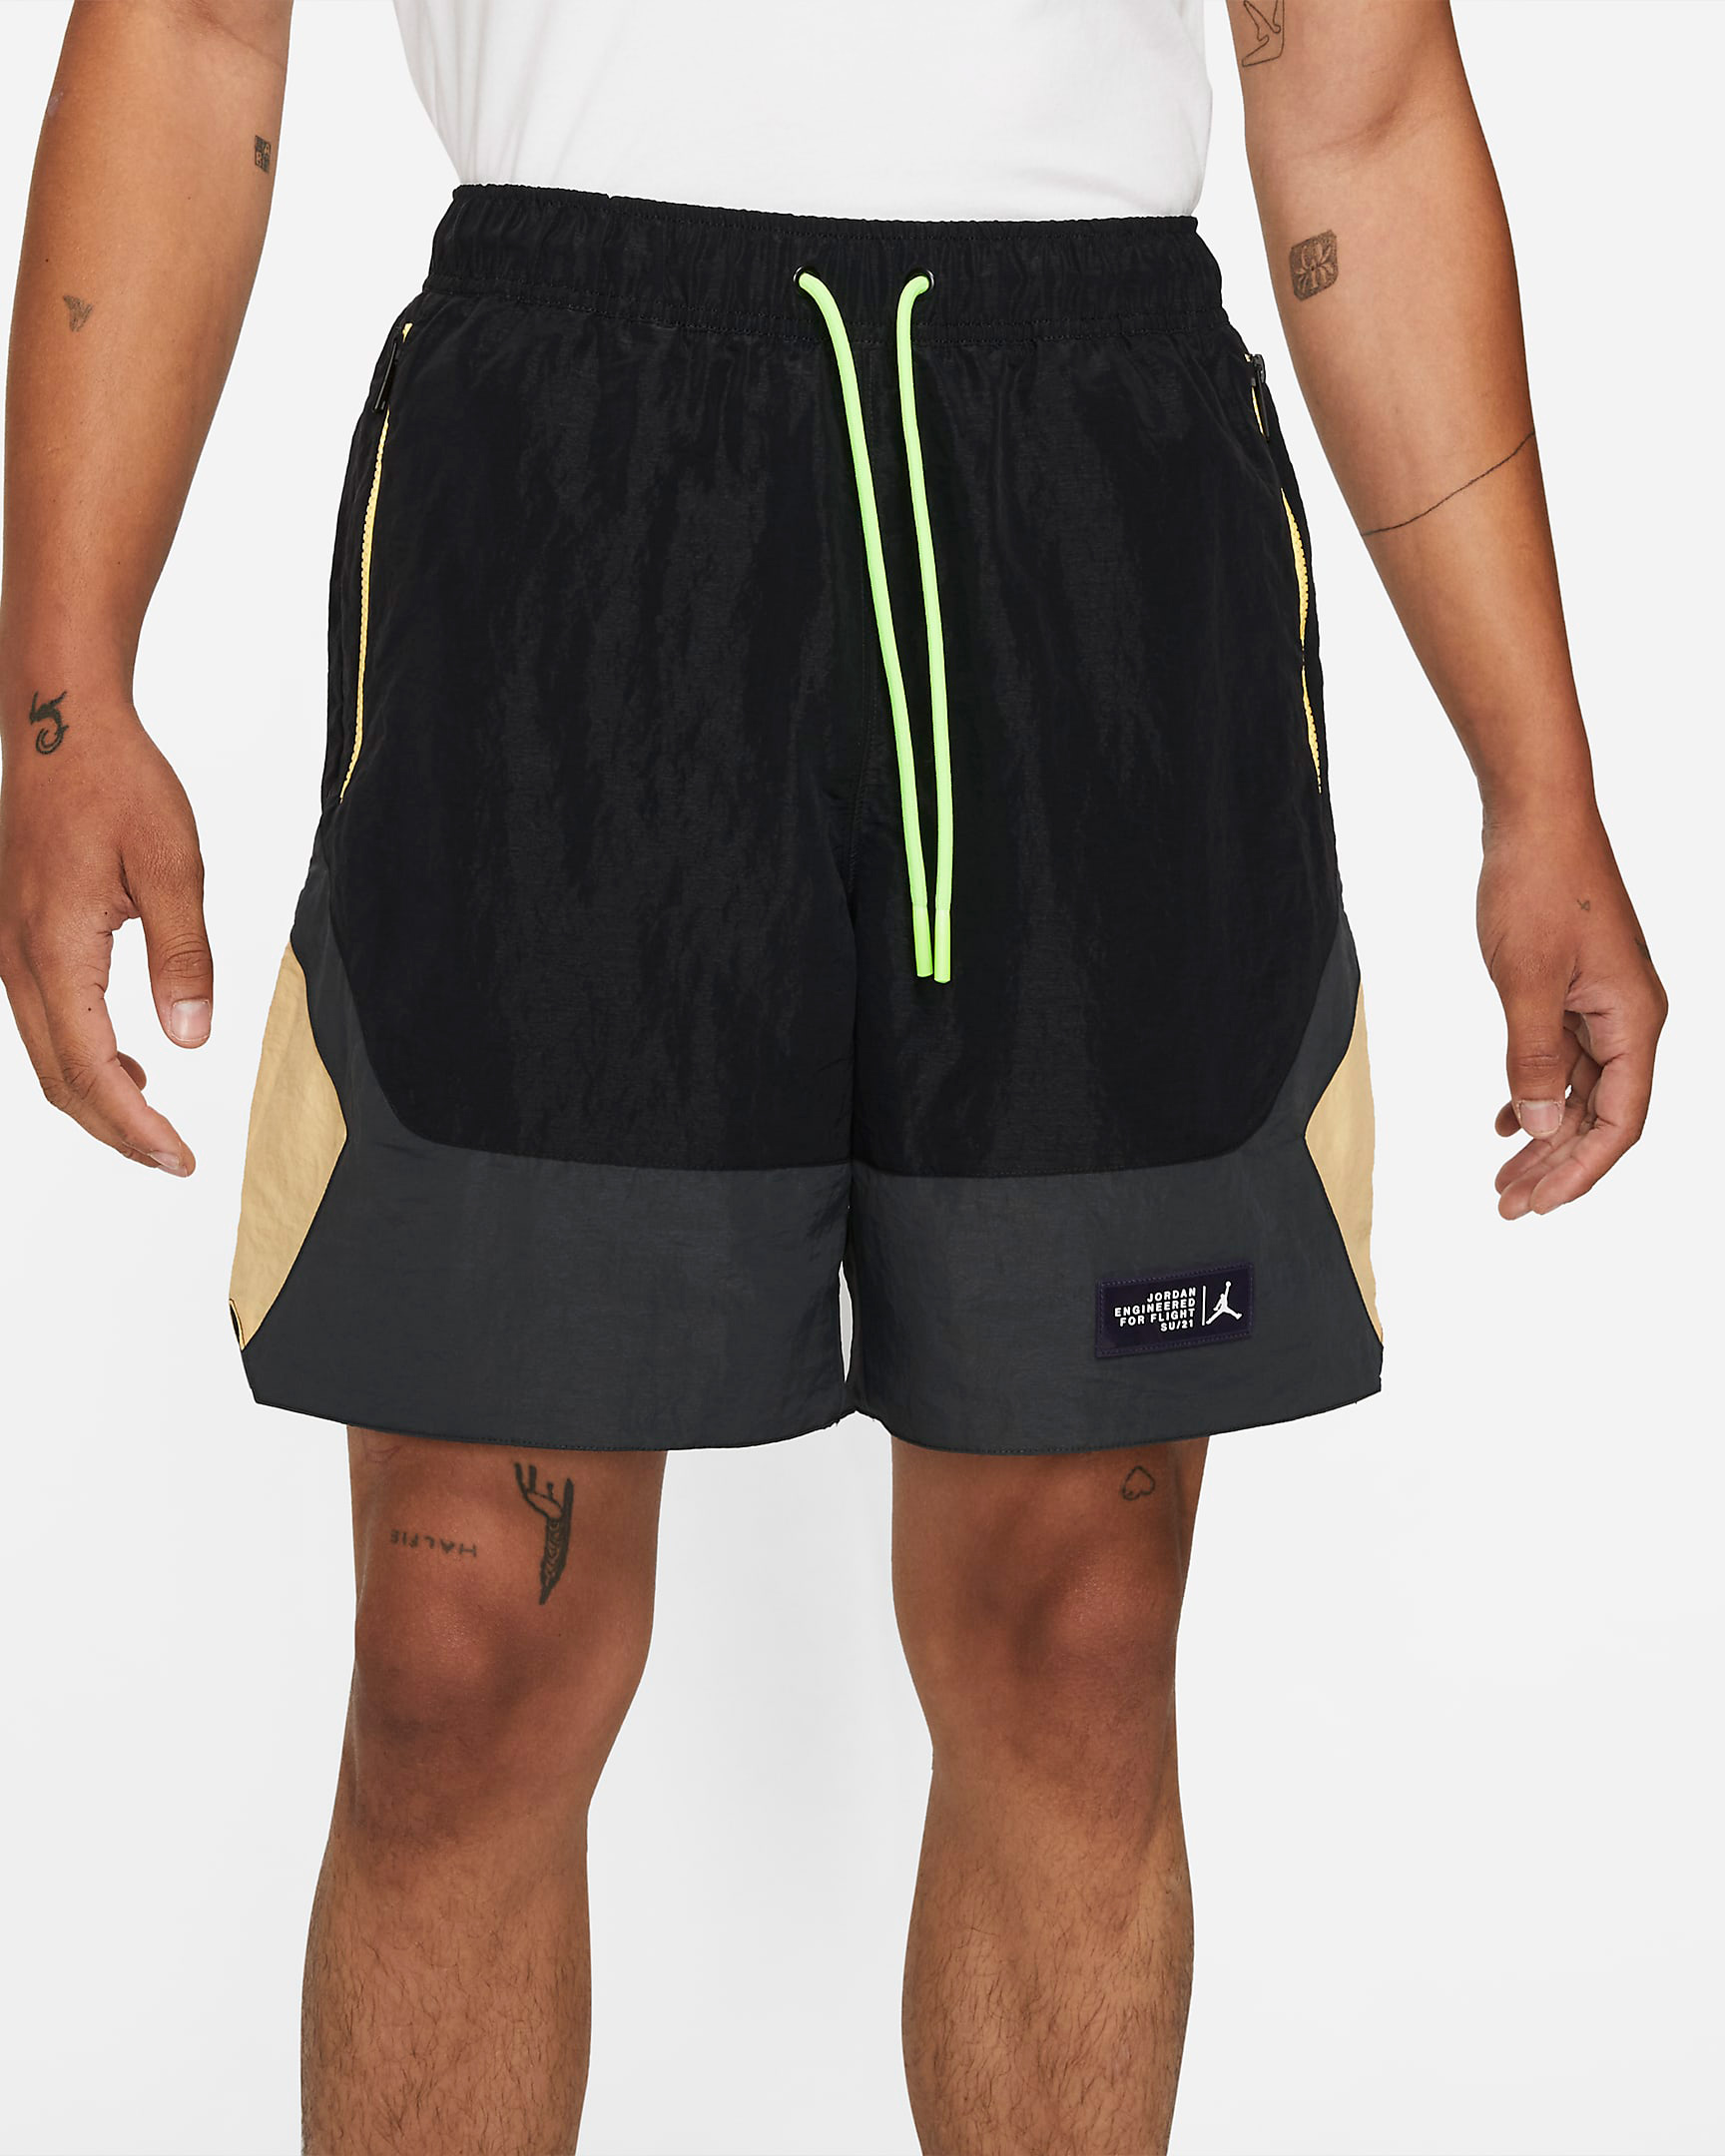 jordan-23-engineered-shorts-black-electric-green